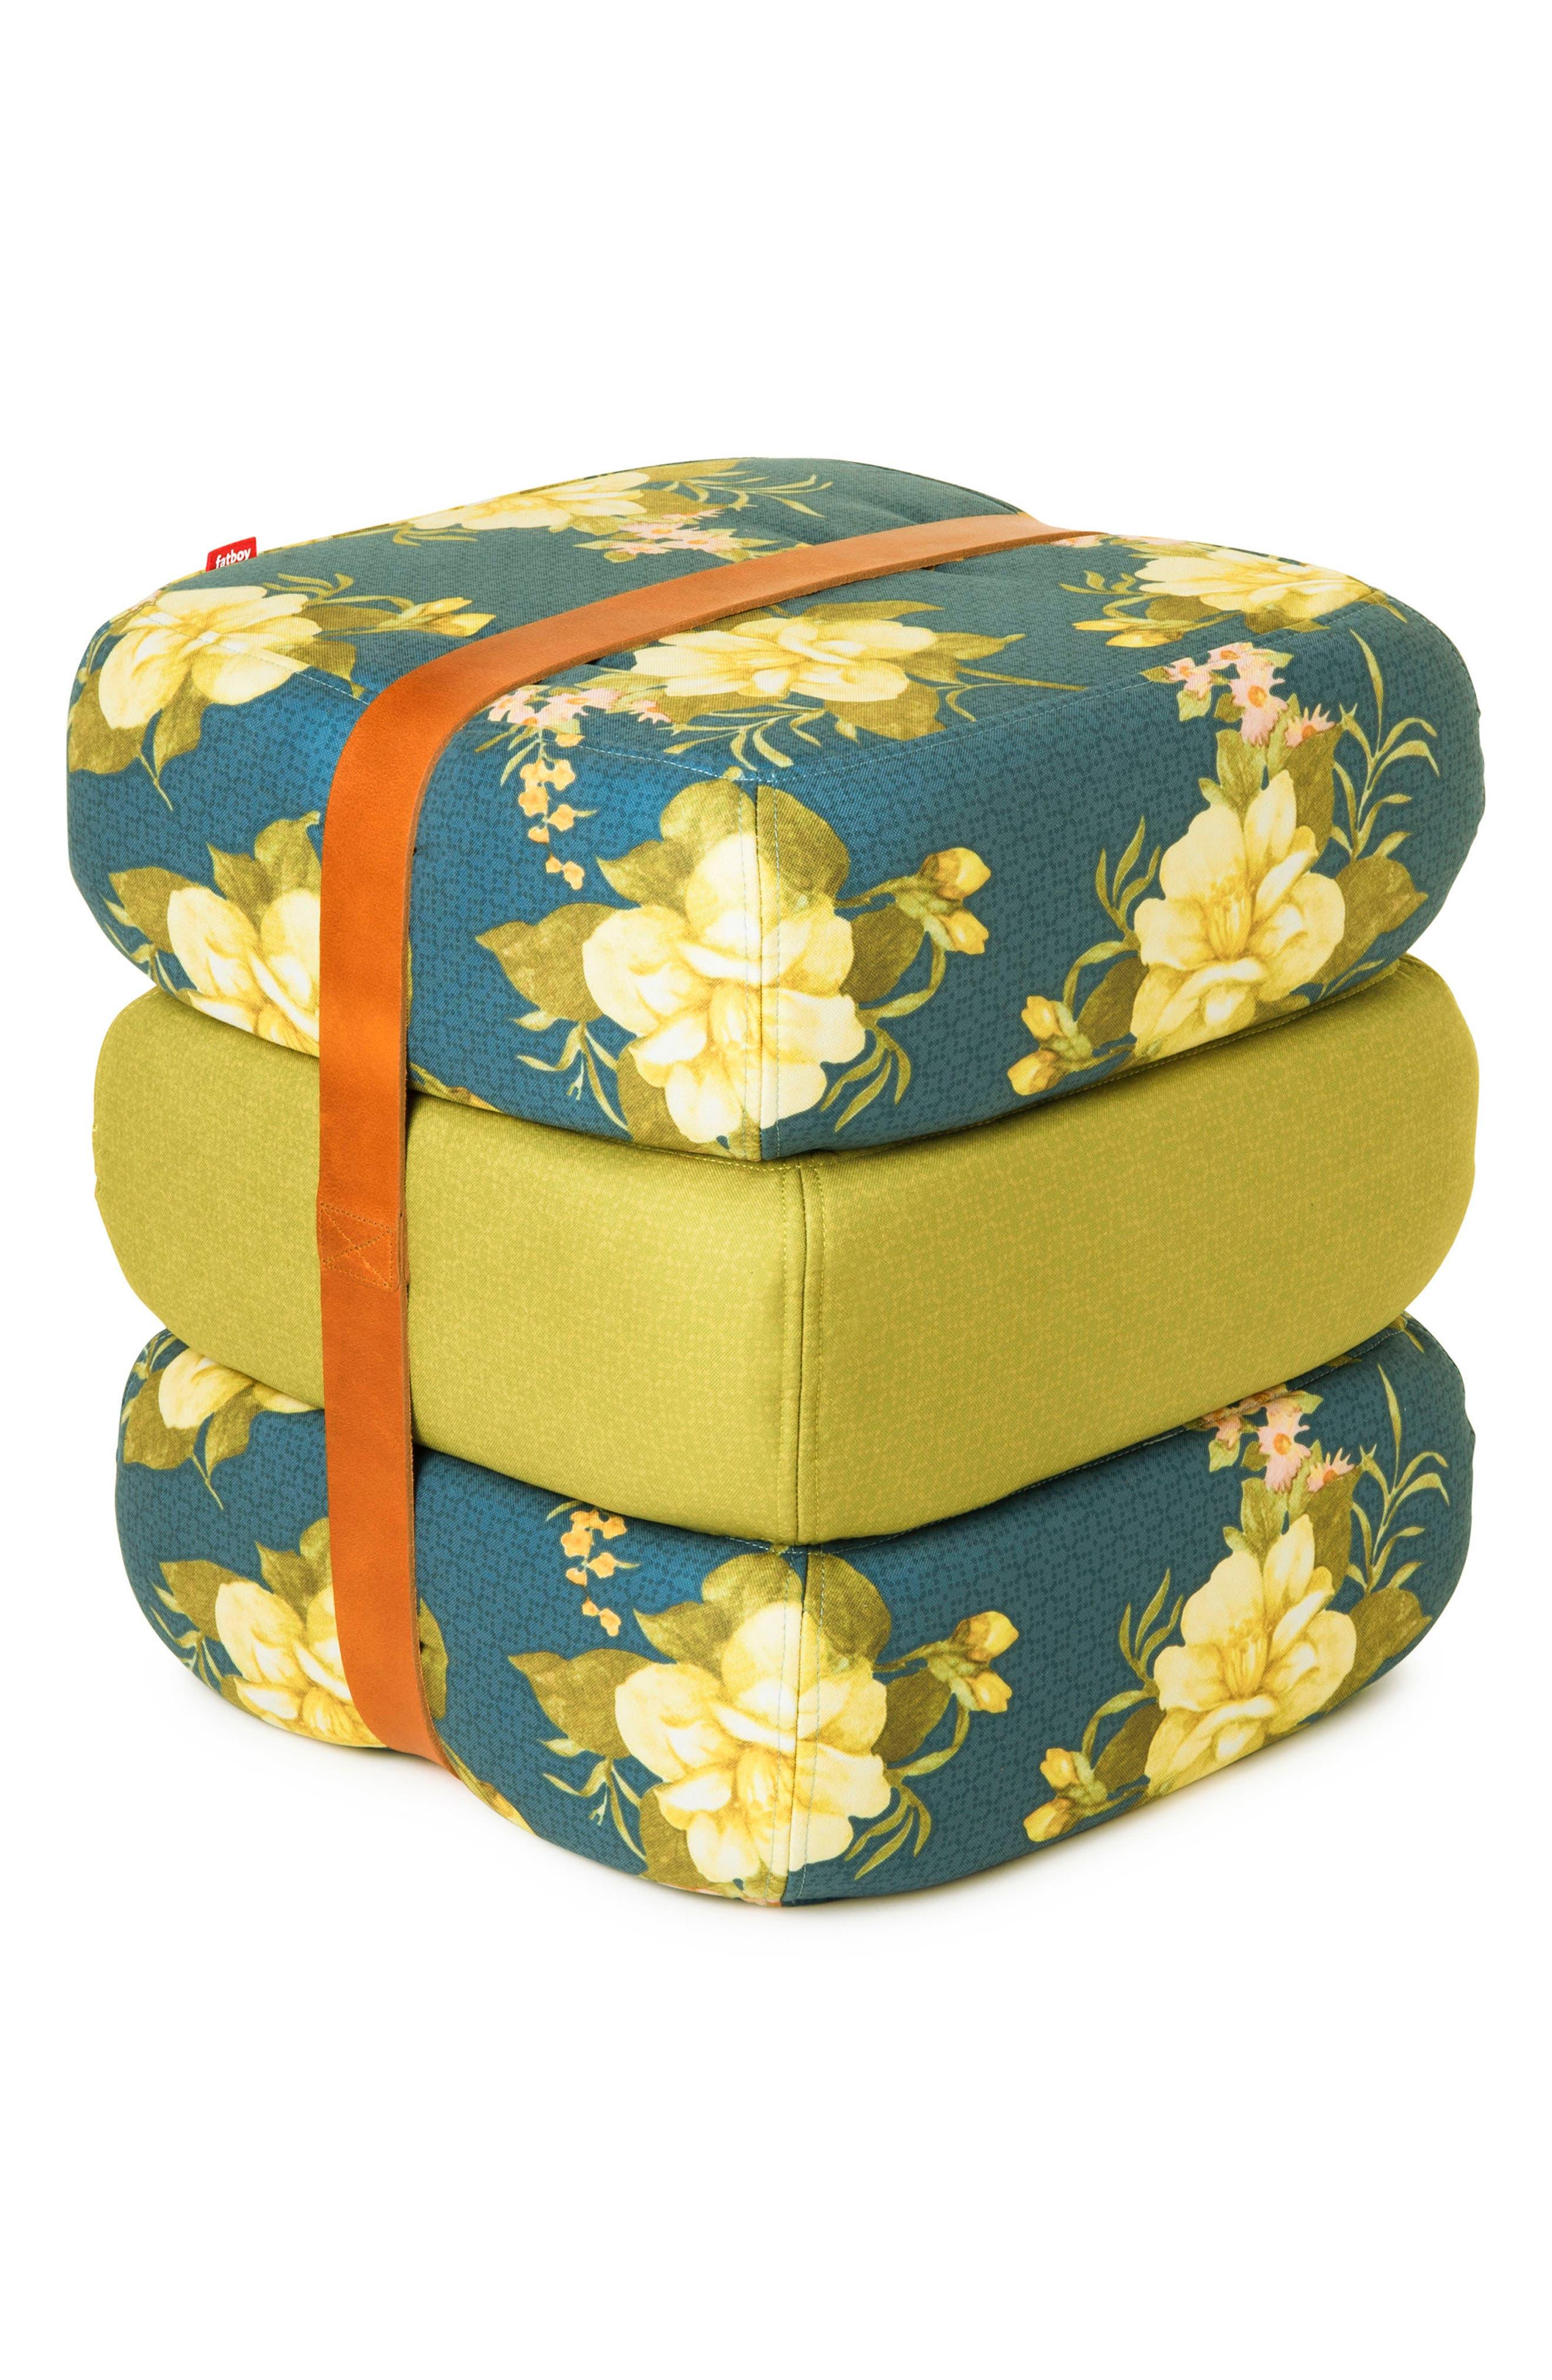 FATBOY Baboesjka Set of 3 Pillows, Main, color, 403